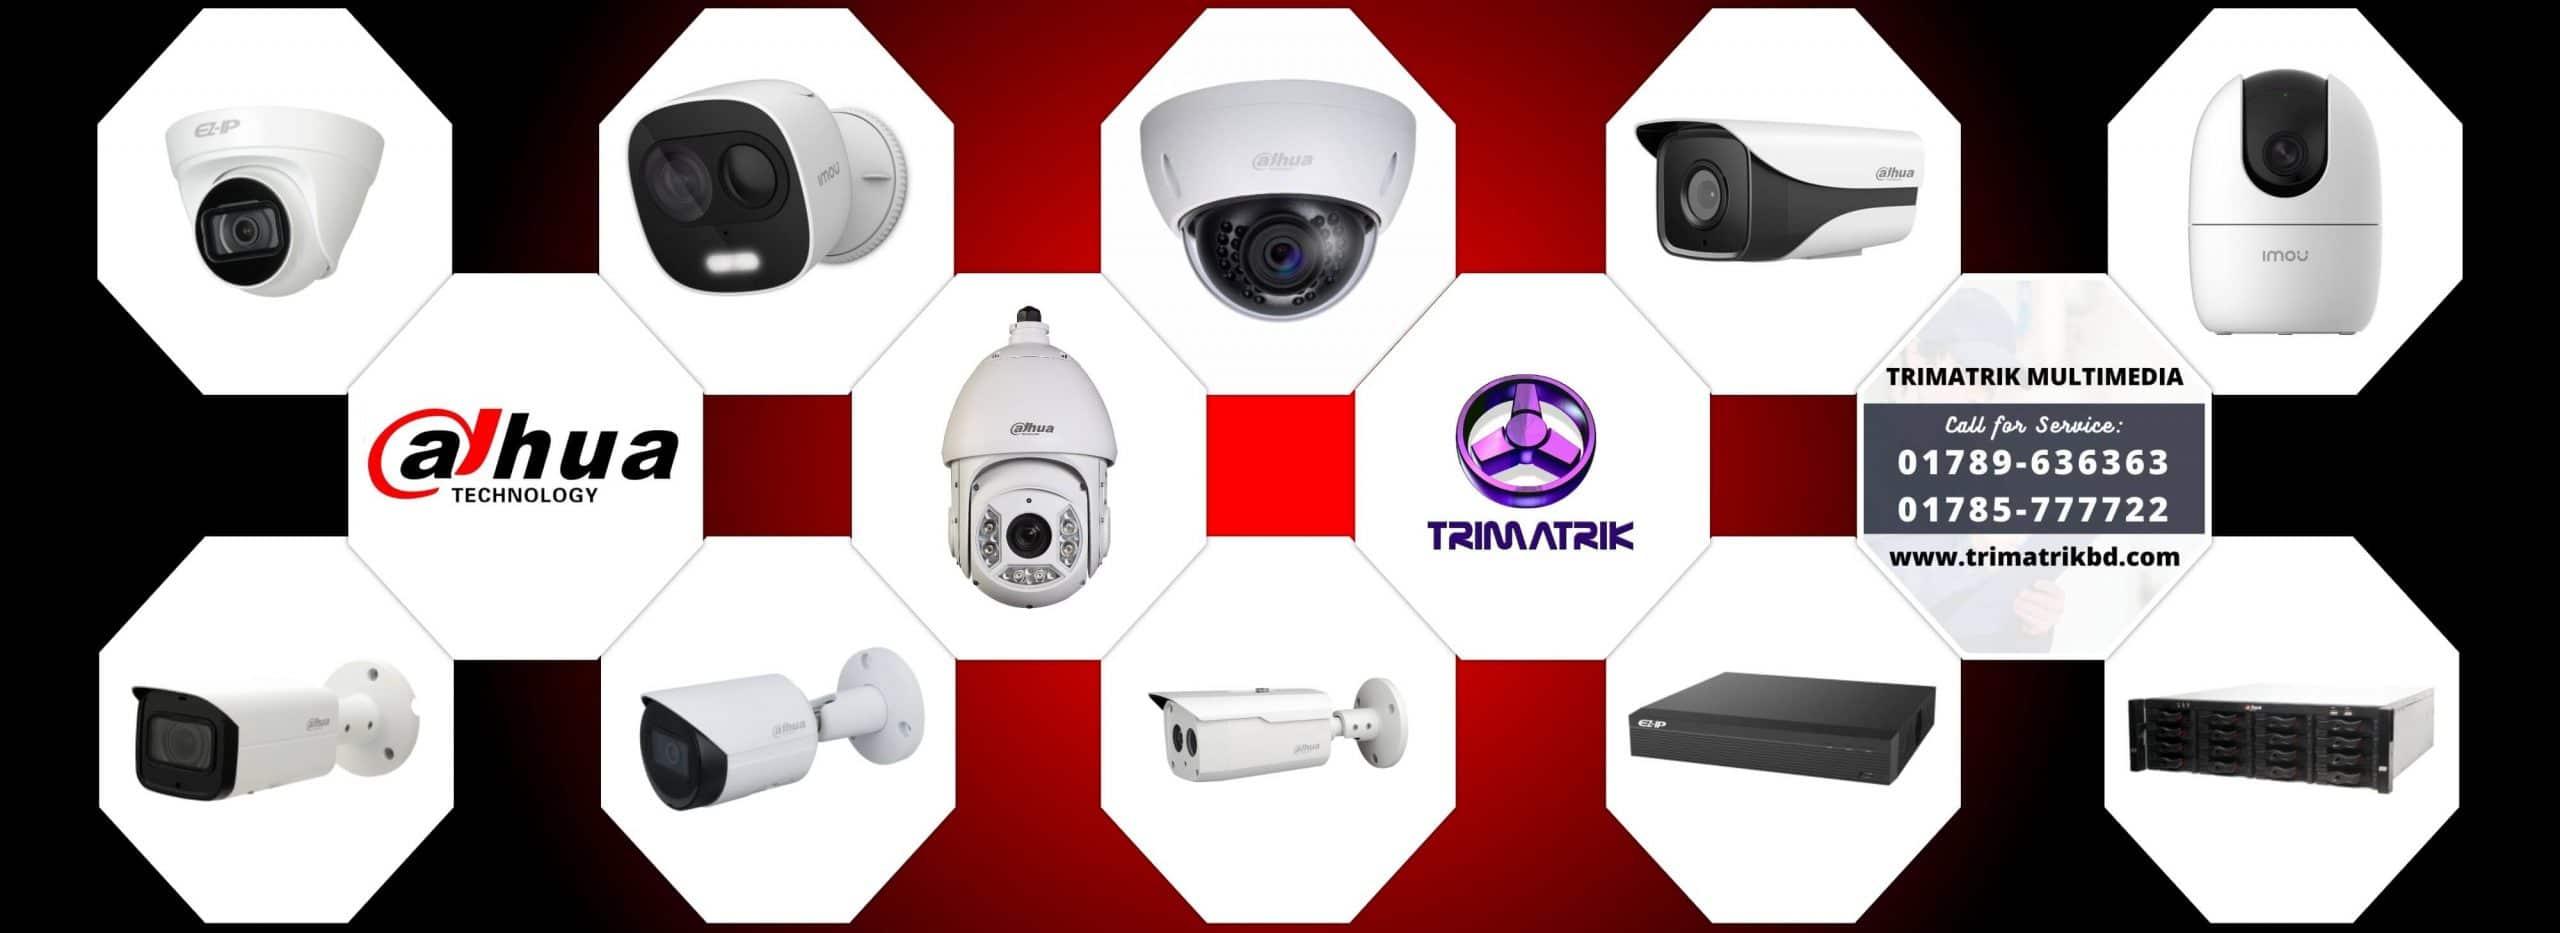 Dahua IP Camera Price in Bangladesh